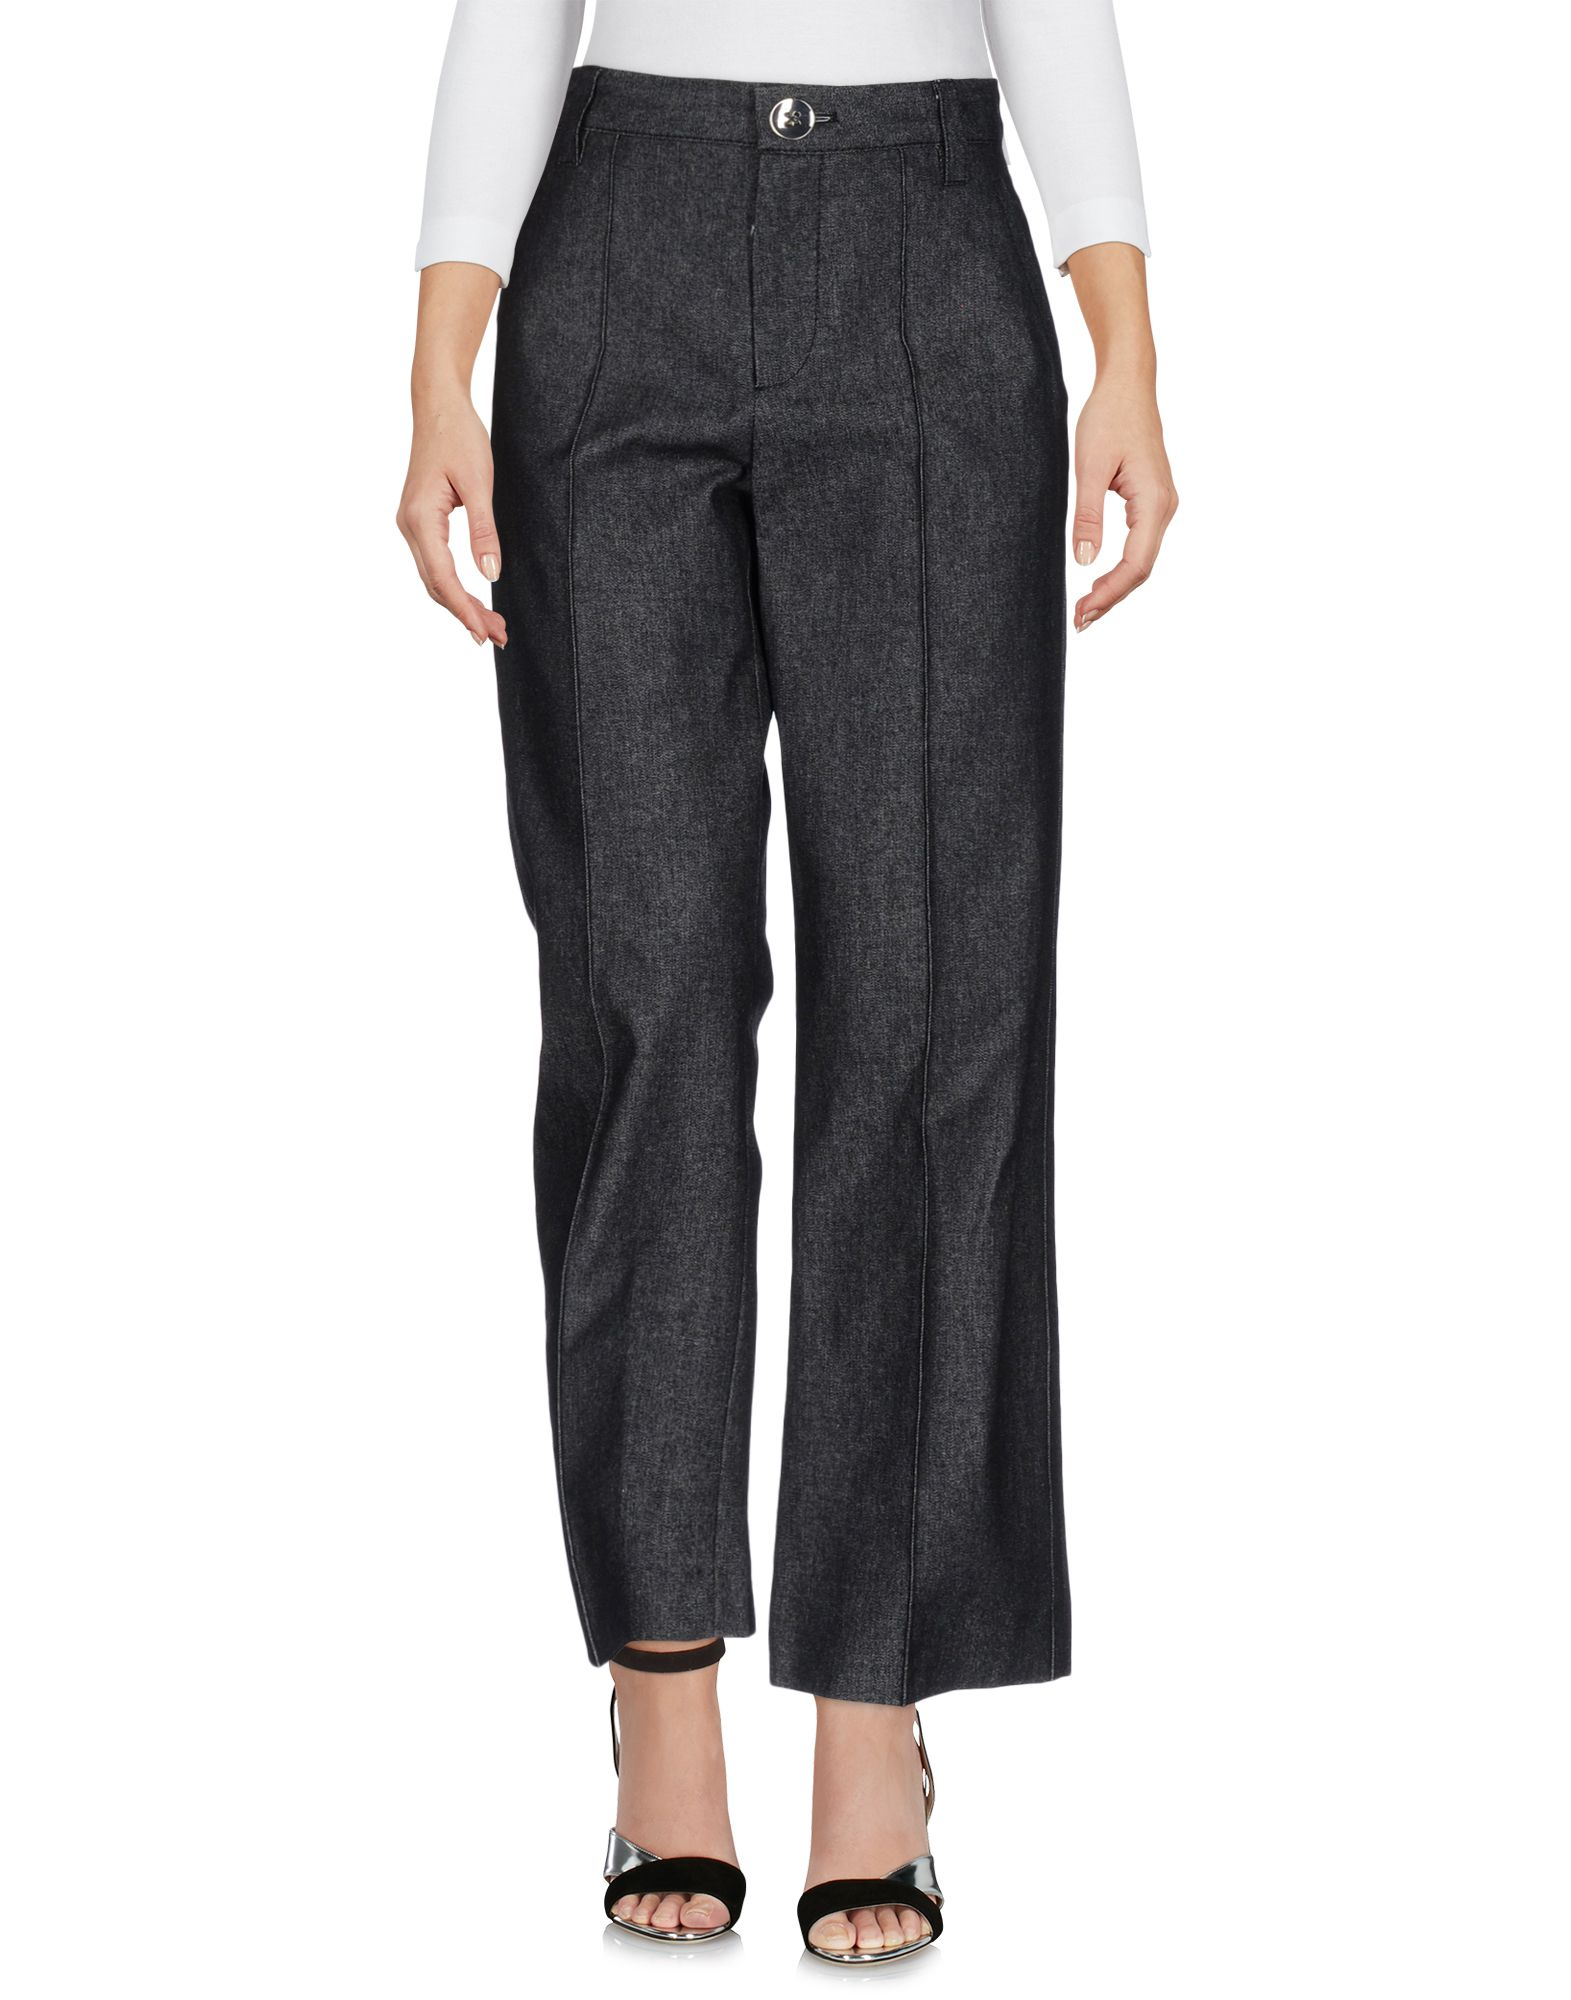 MARC JACOBS Damen Jeanshose Farbe Schwarz Größe 4